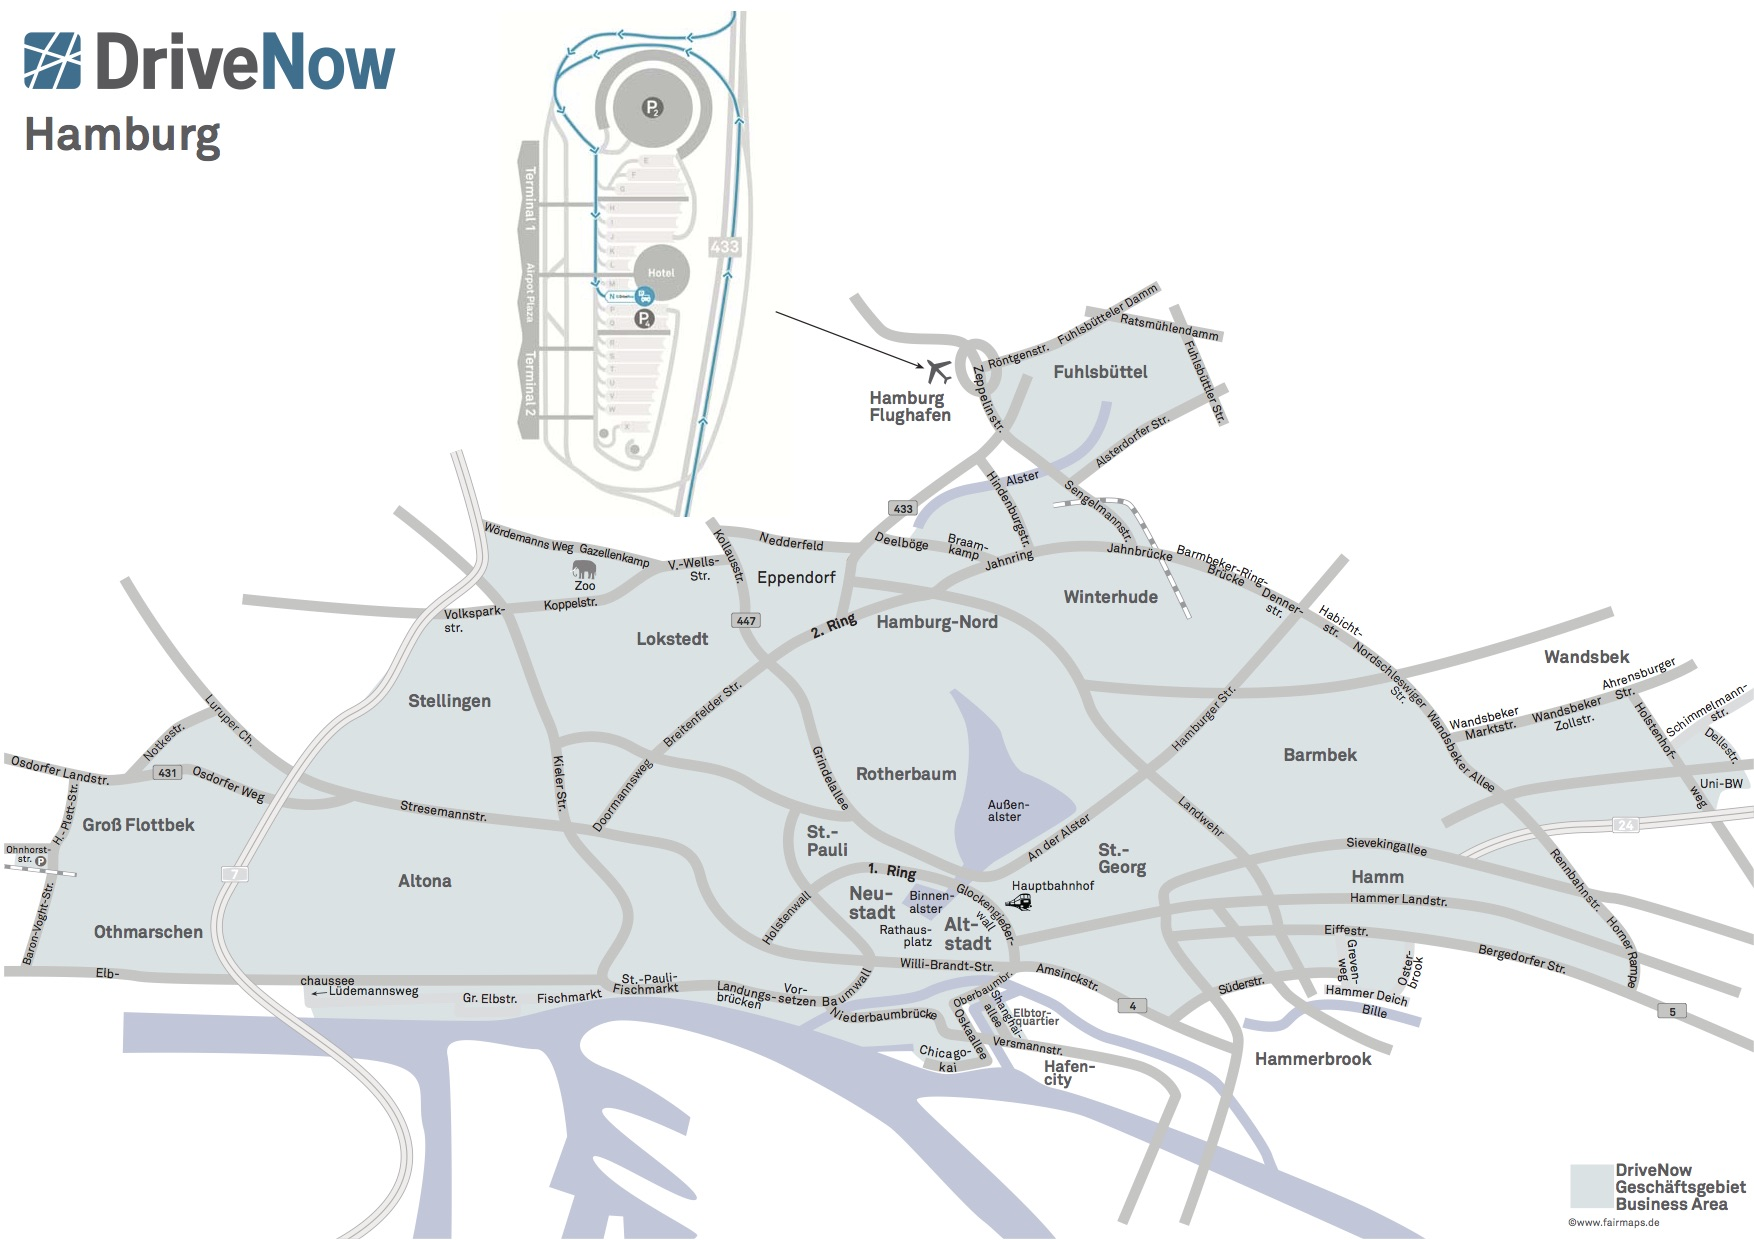 DriveNow_Geschaeftsgebiet_Hamburg